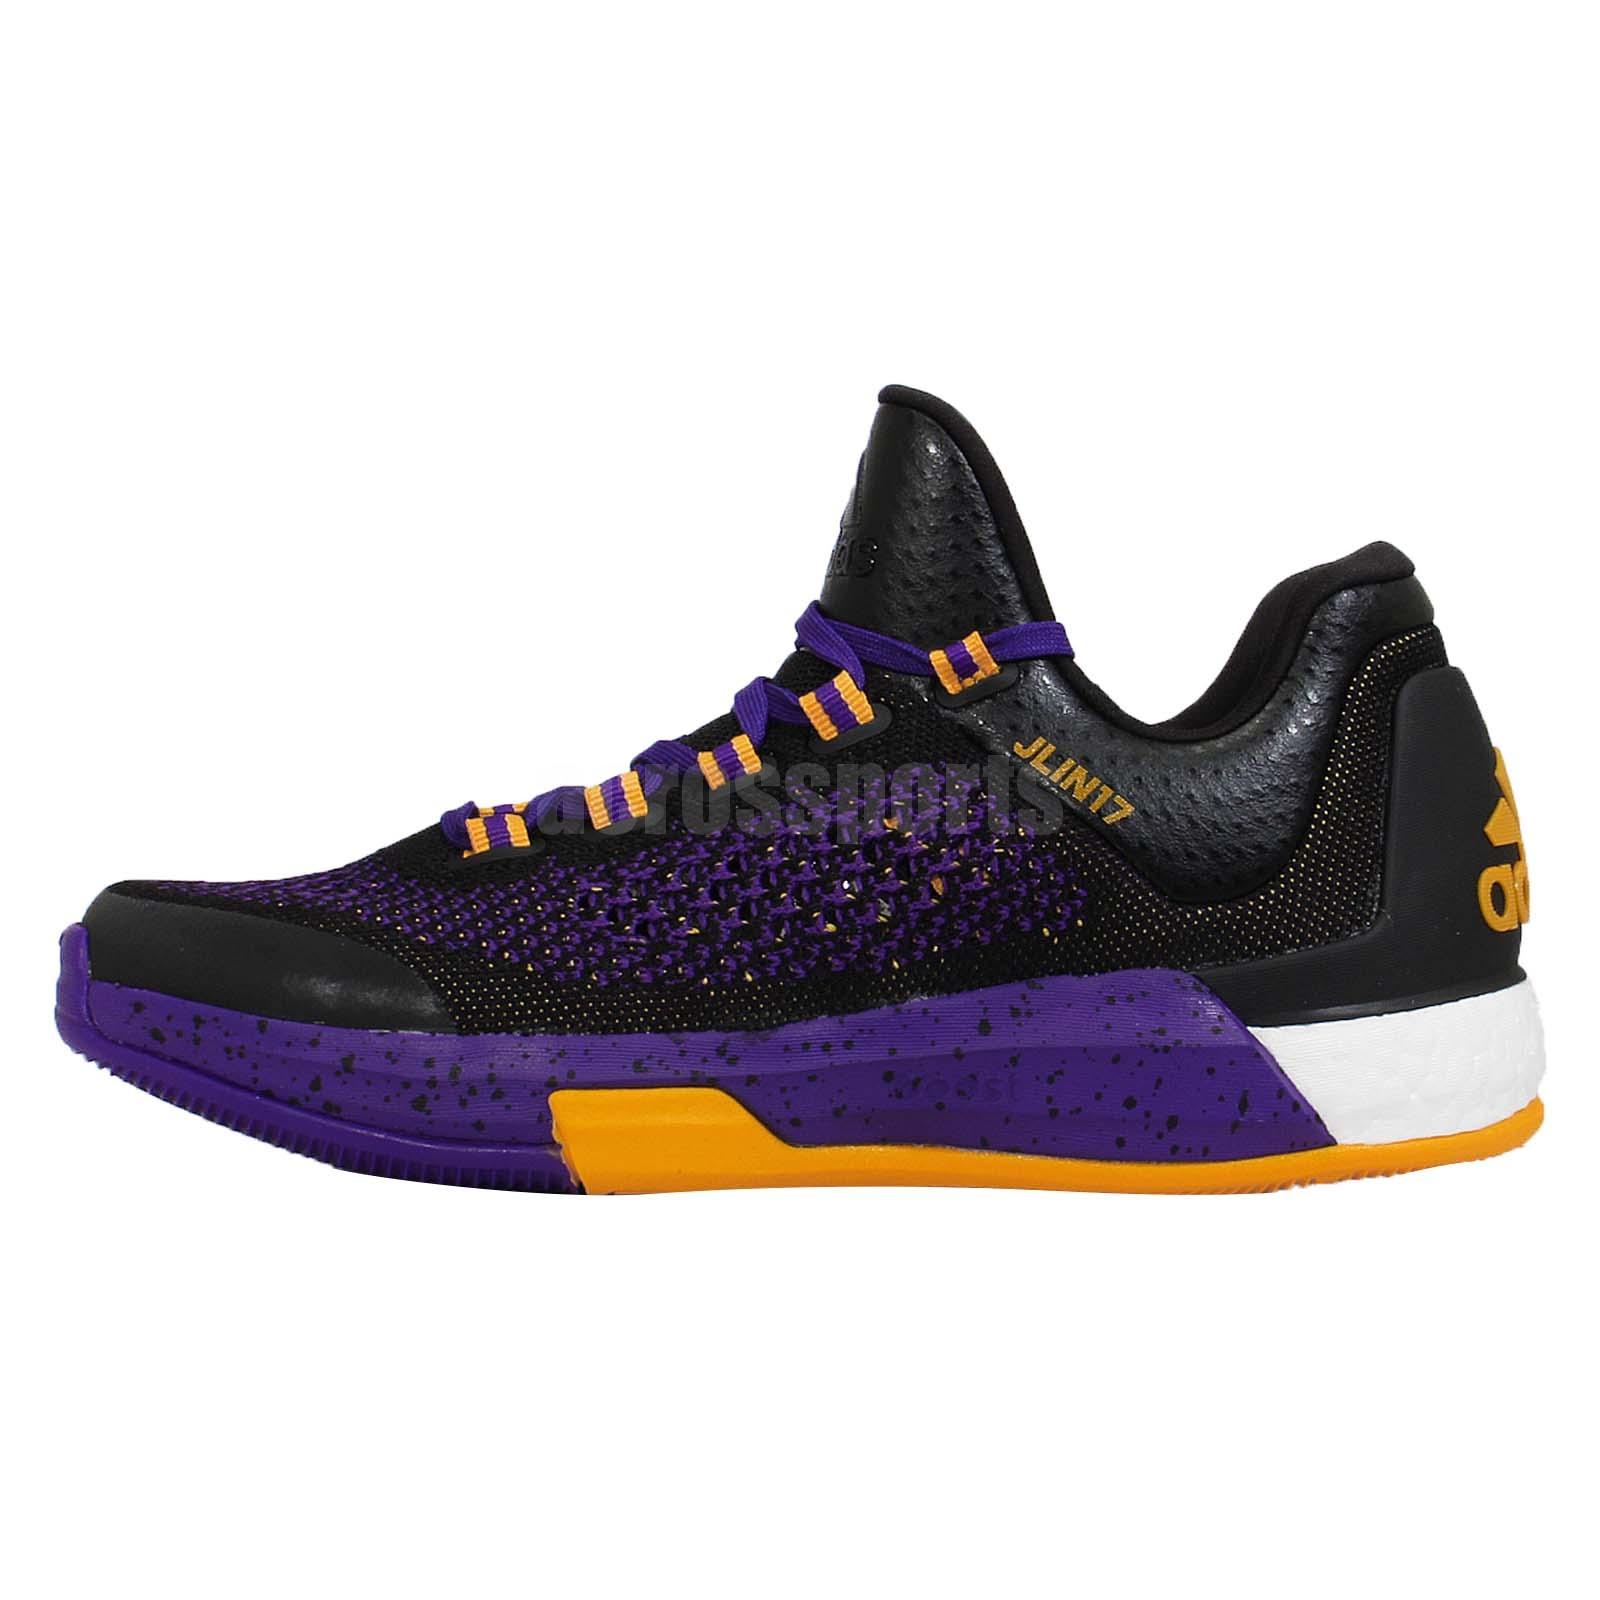 Jeremy Lin Adidas Shoes